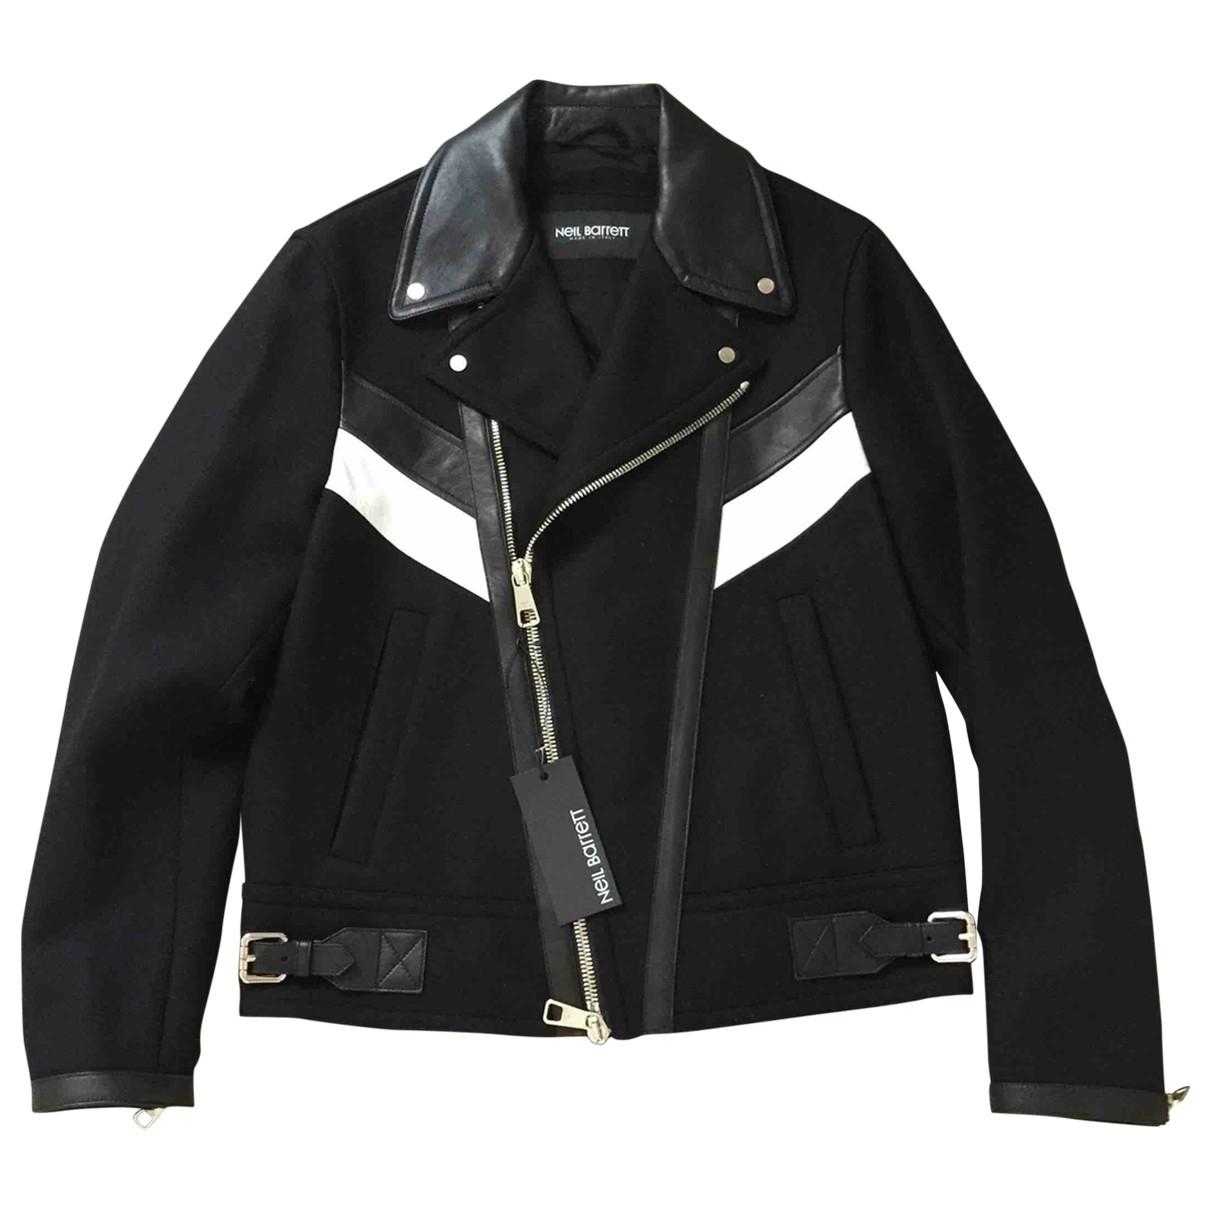 Neil Barrett \N Black Wool jacket  for Men S International